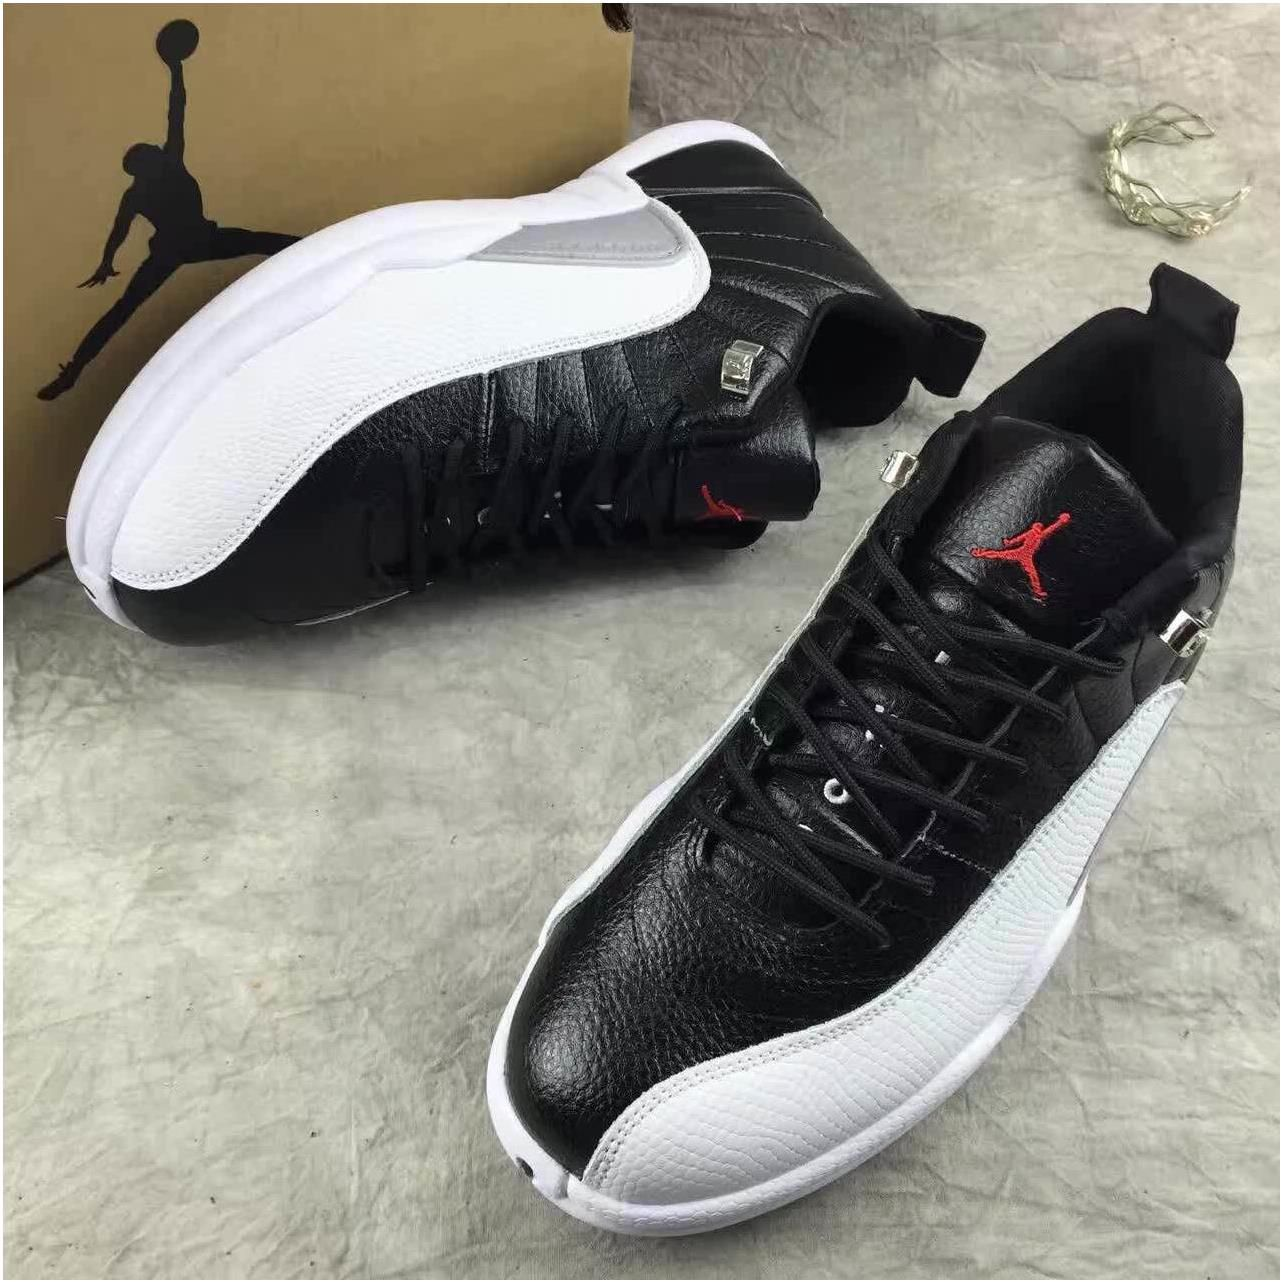 2d06ee96790 Nike Air Jordan Retro XII 12 Low Black White Men Shoes 3083170 | Air ...